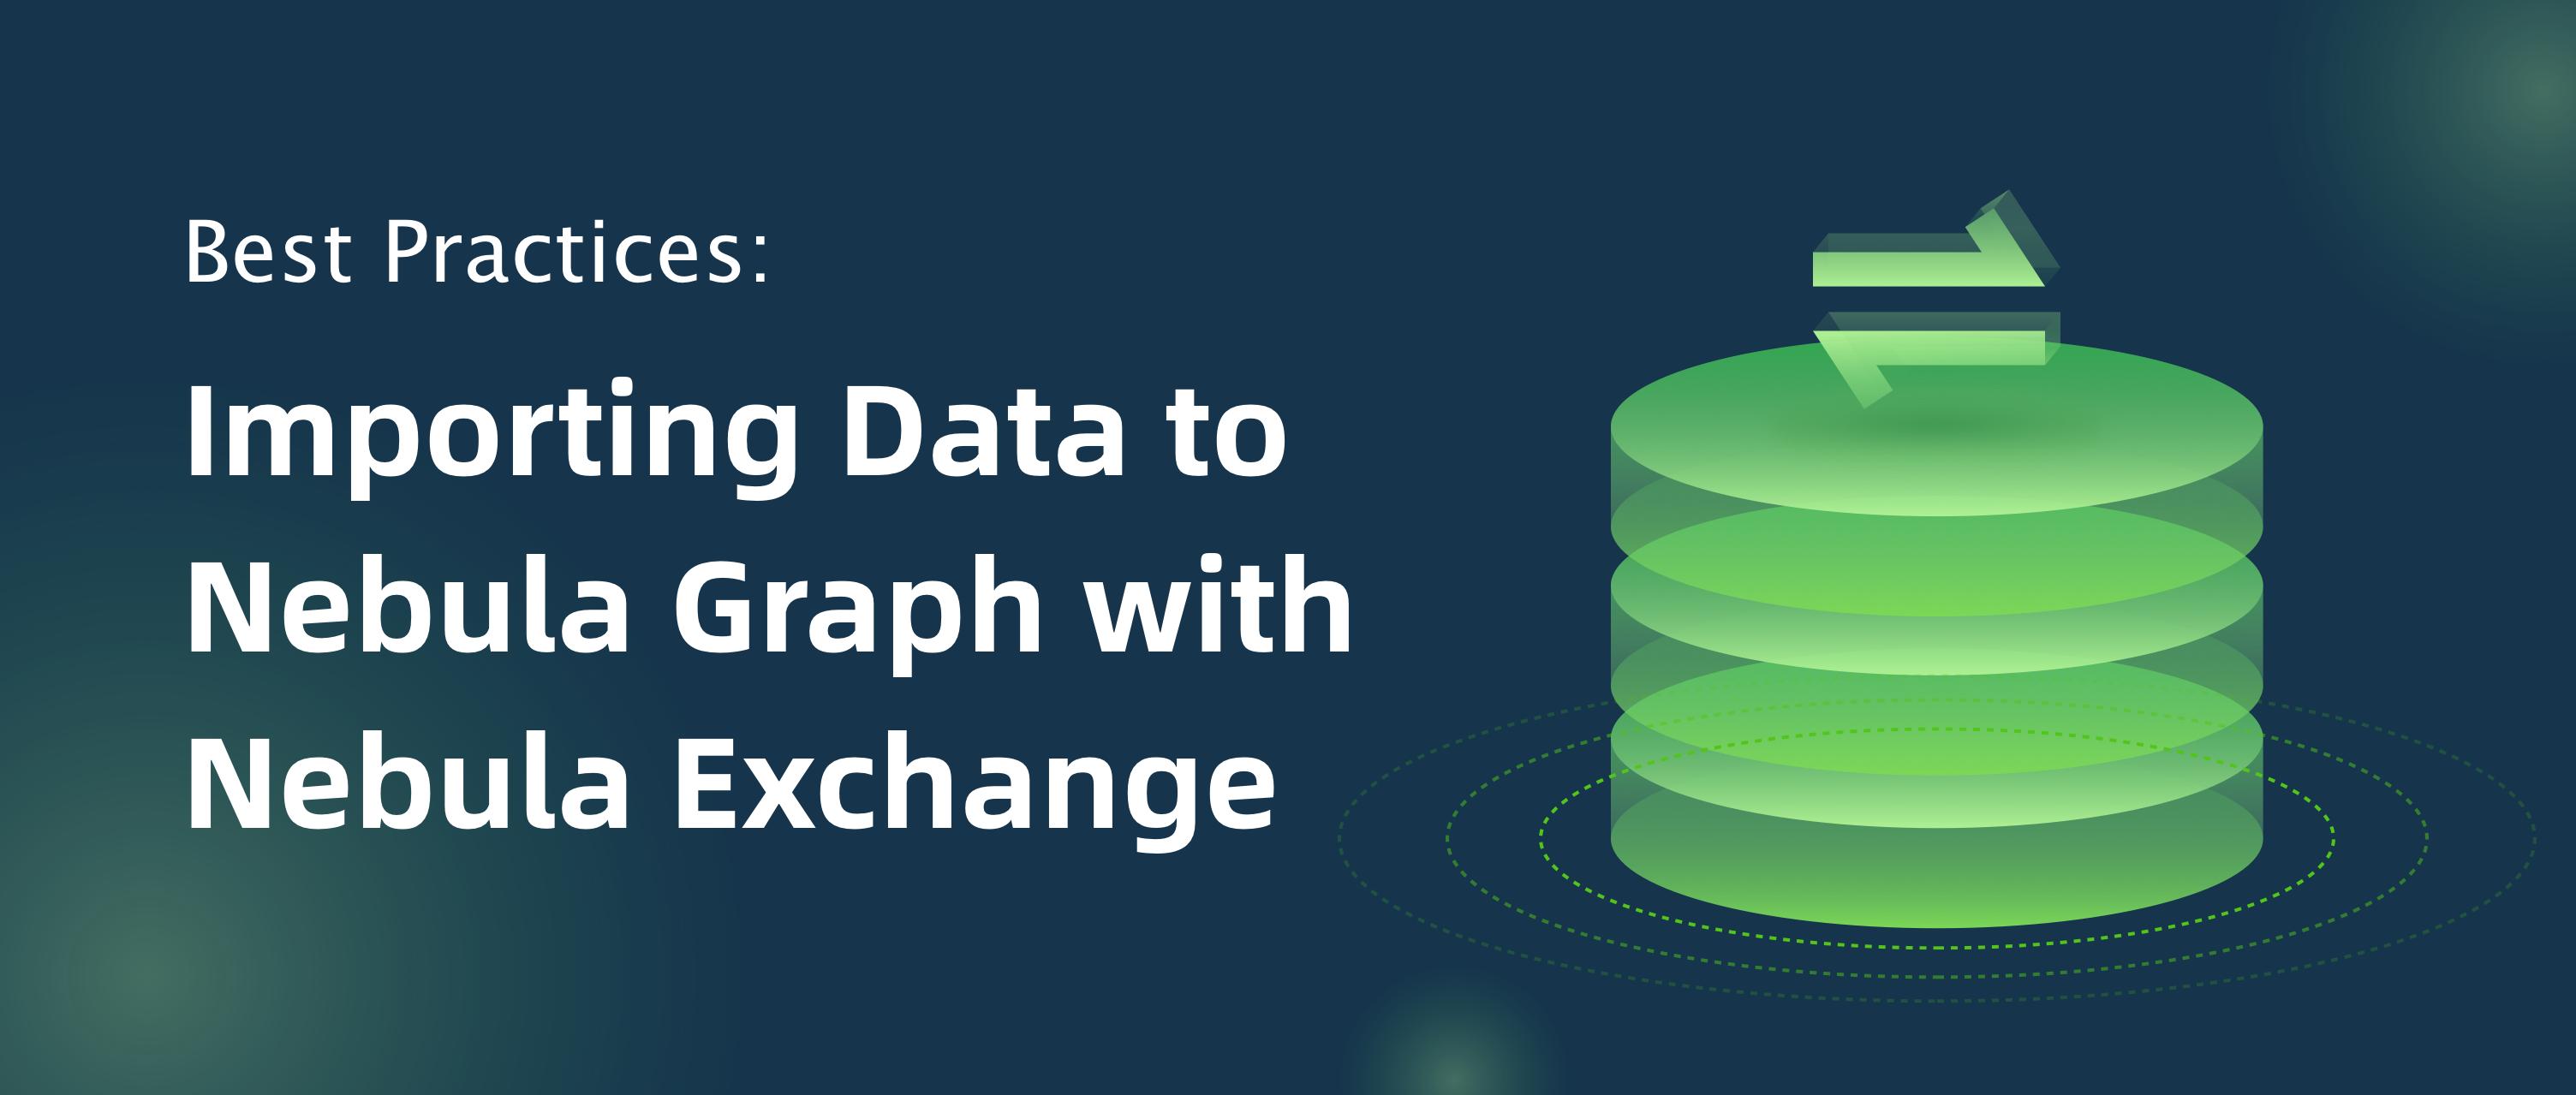 best-practices-import-data-spark-nebula-graph